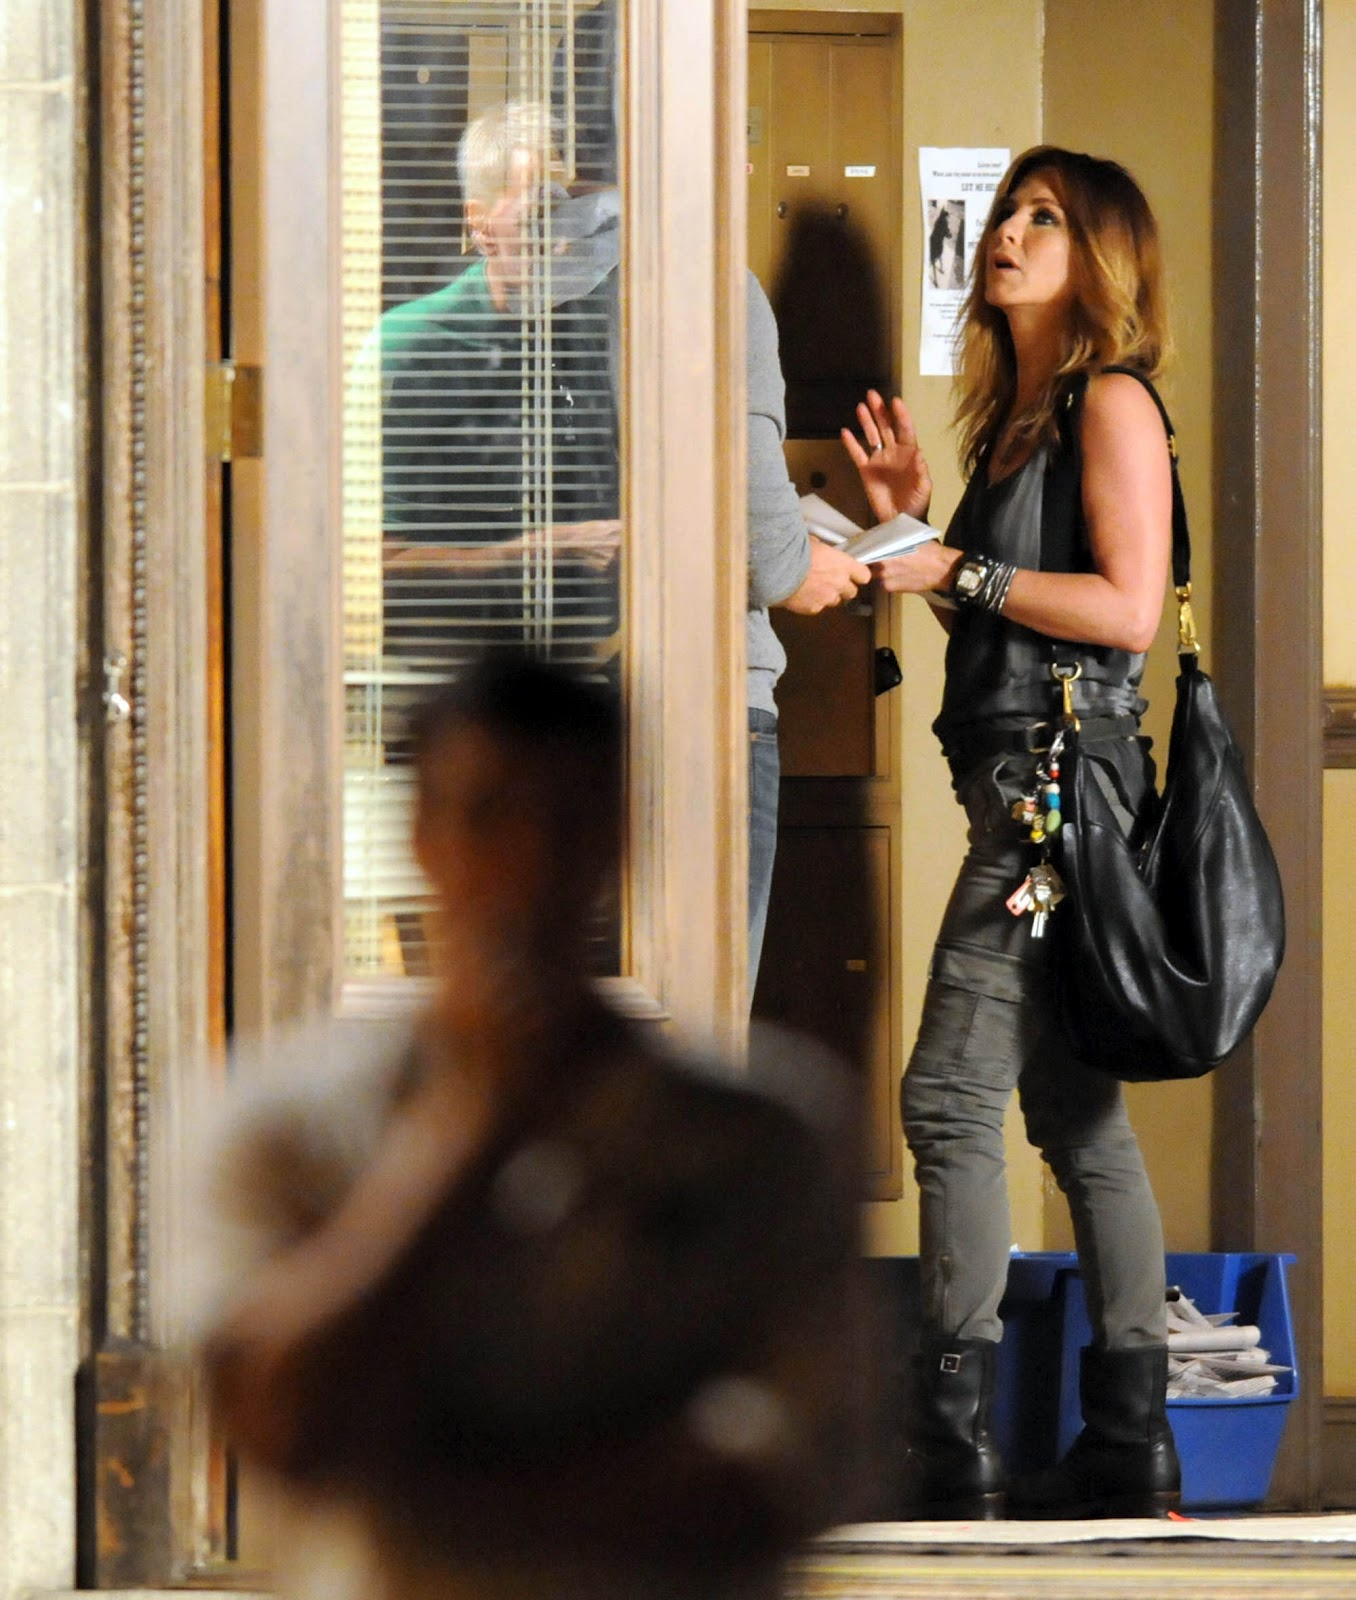 http://3.bp.blogspot.com/-xj4QyXwZV0c/UCgJOh-k3EI/AAAAAAAAXYA/lLsxn5tA4Dg/s1600/Jennifer+Aniston+in+Tight+Jeans+-+On+the+set+of+We\'re+the+Millers+in+Wilmington+August+7,++2012+02.jpg